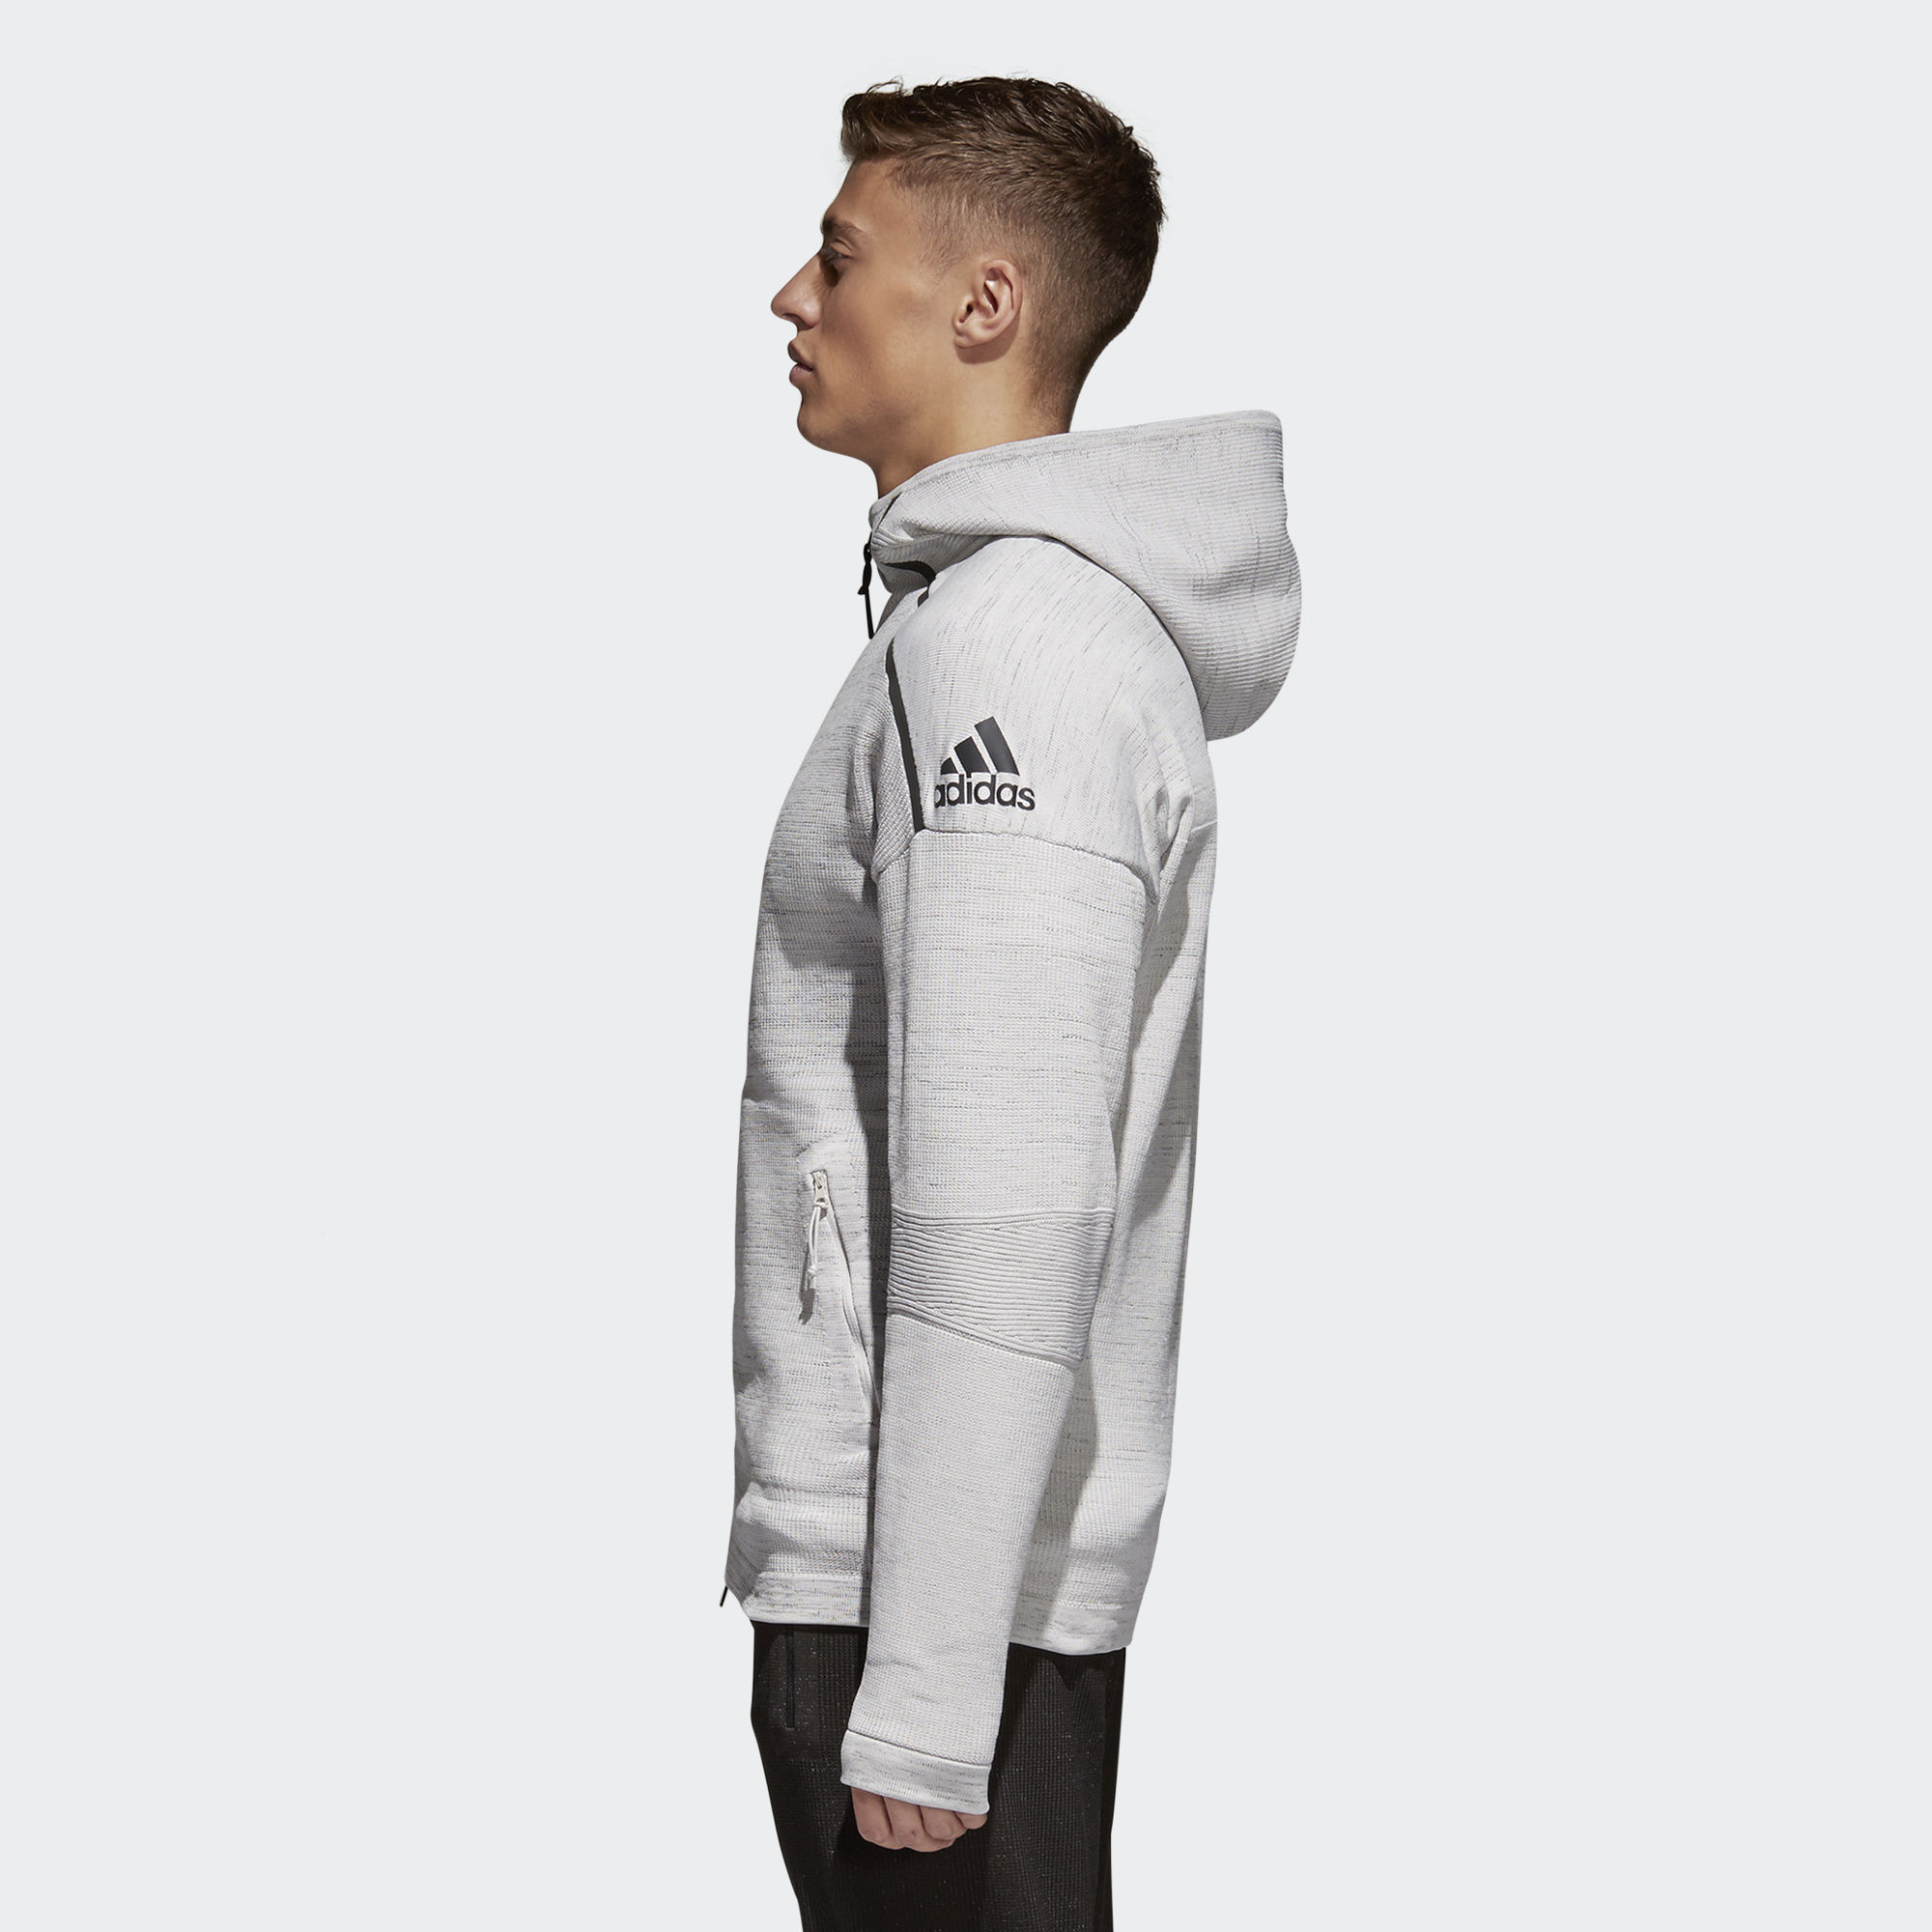 Adidas Z.n.e. Primeknit Hoodie | Shoppa Online | Afound